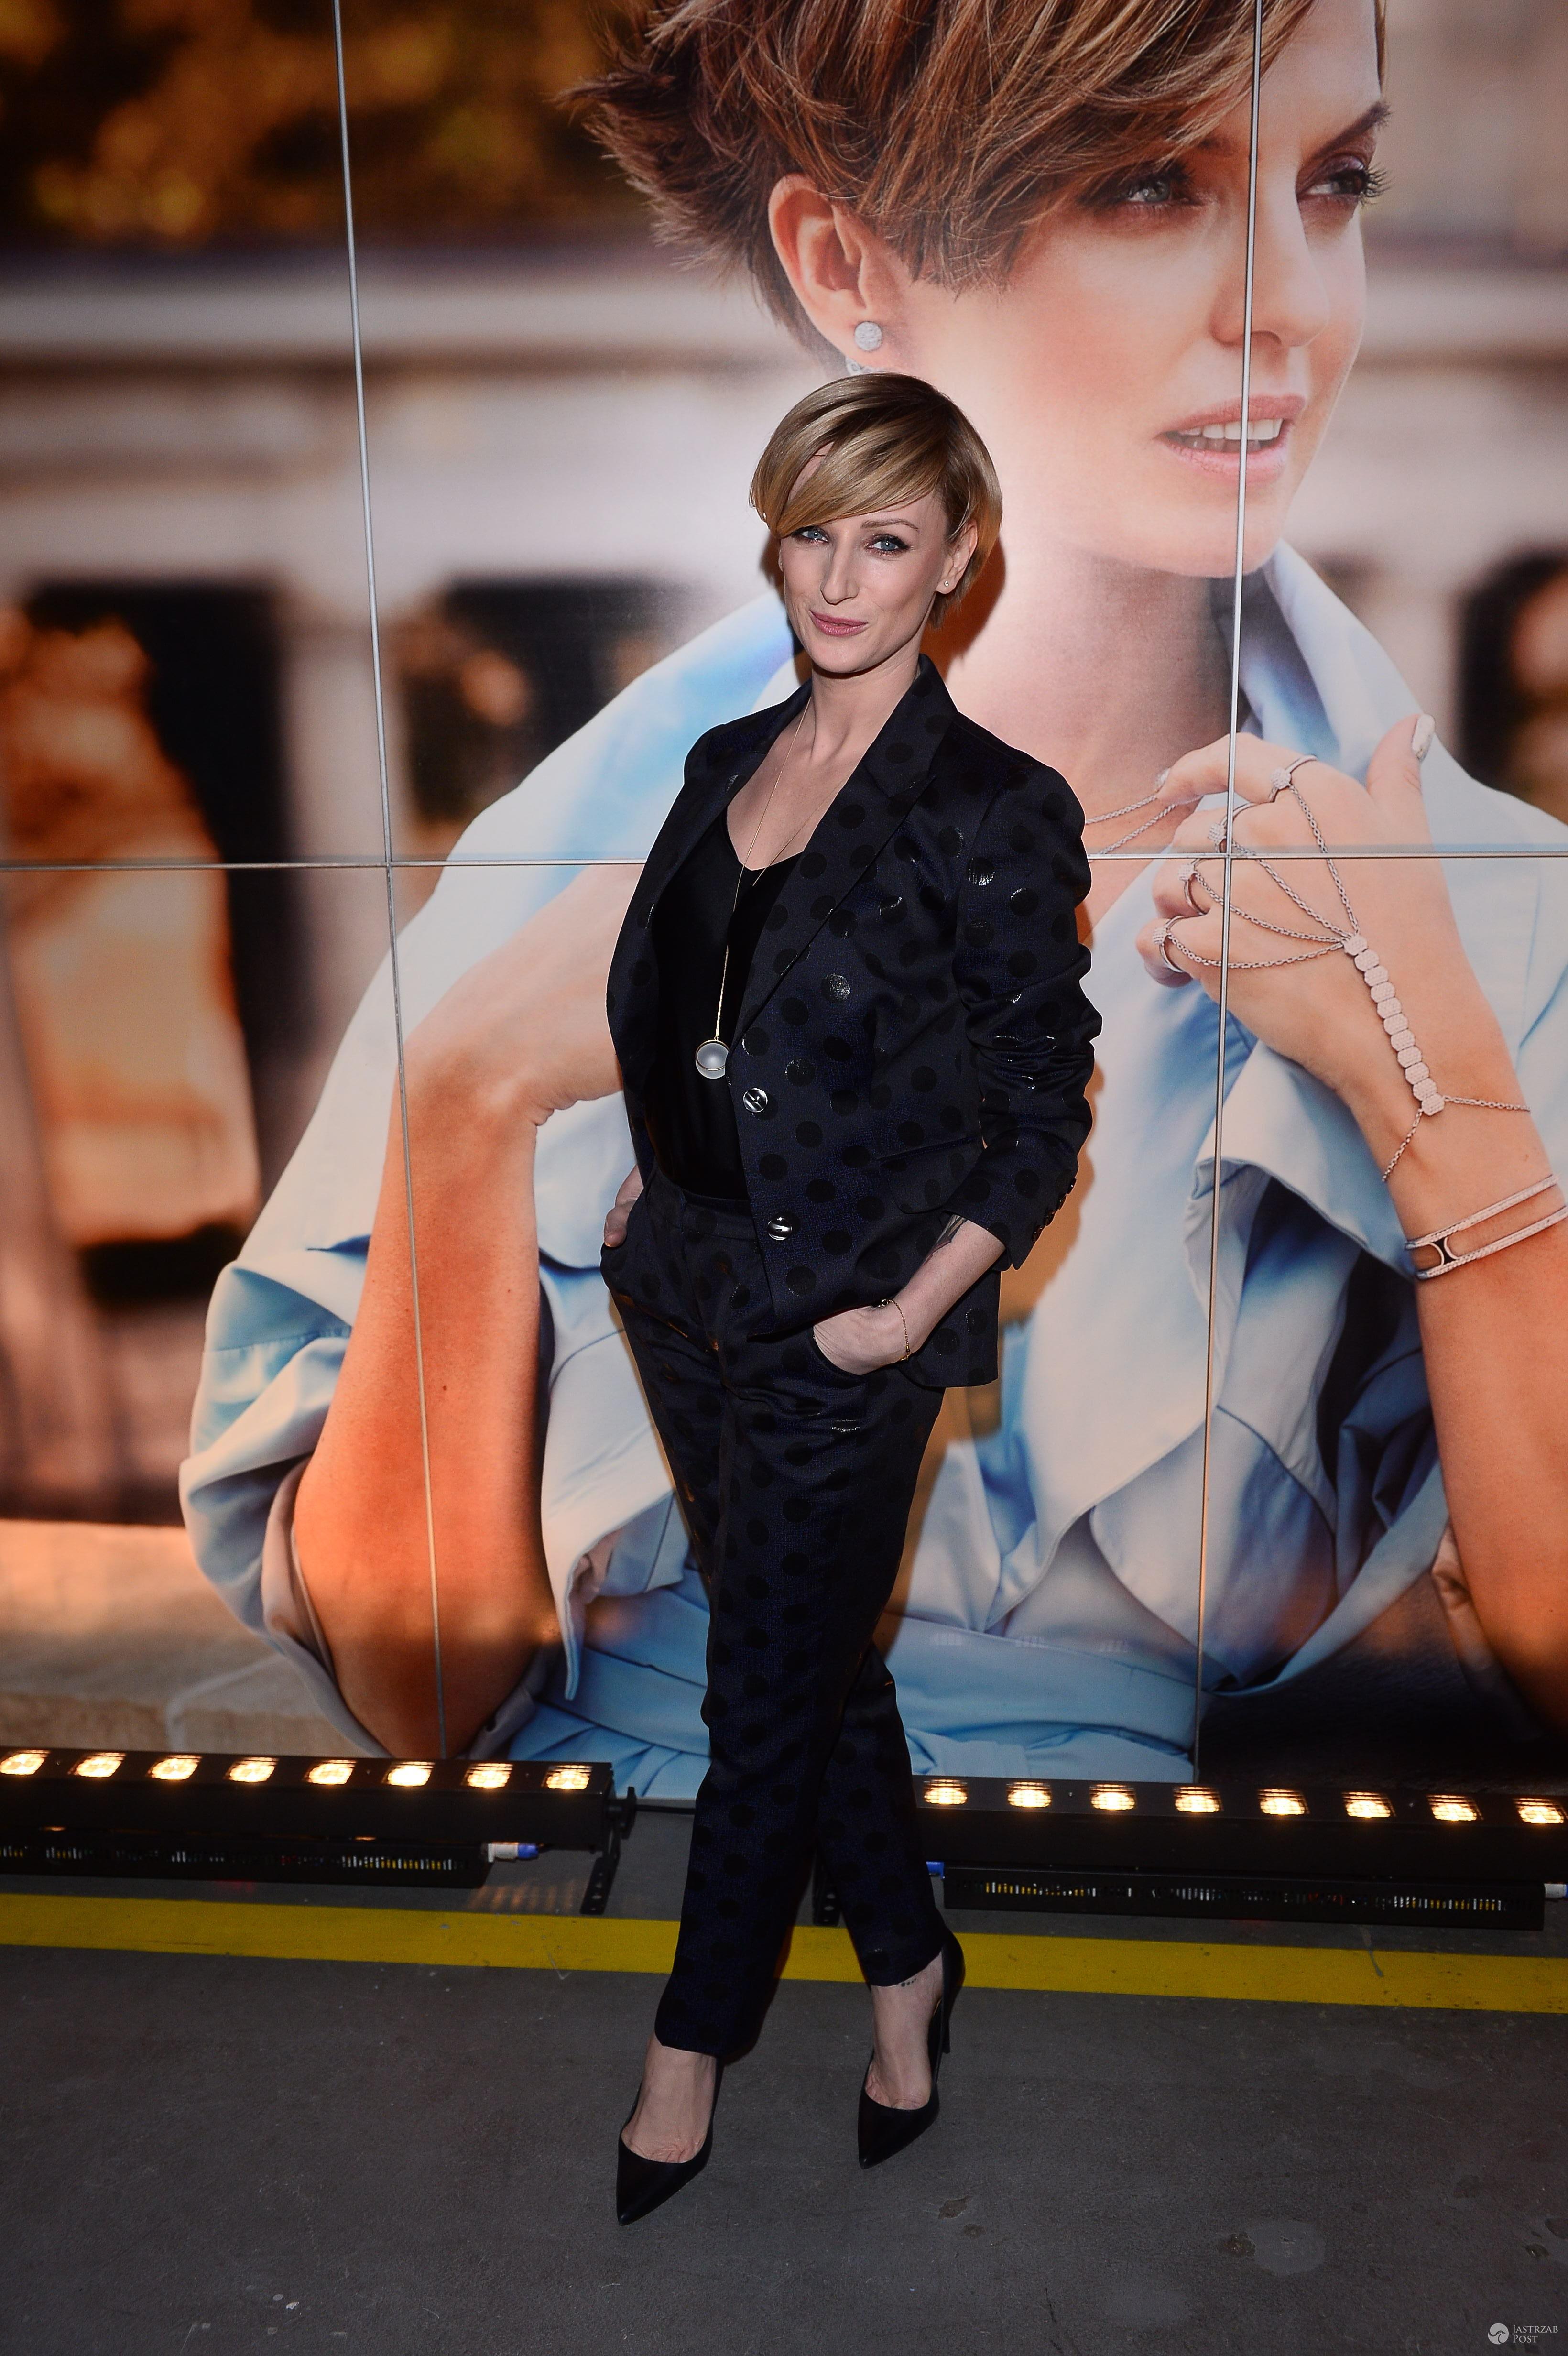 Joanna Krupa Images | Male Models Picture